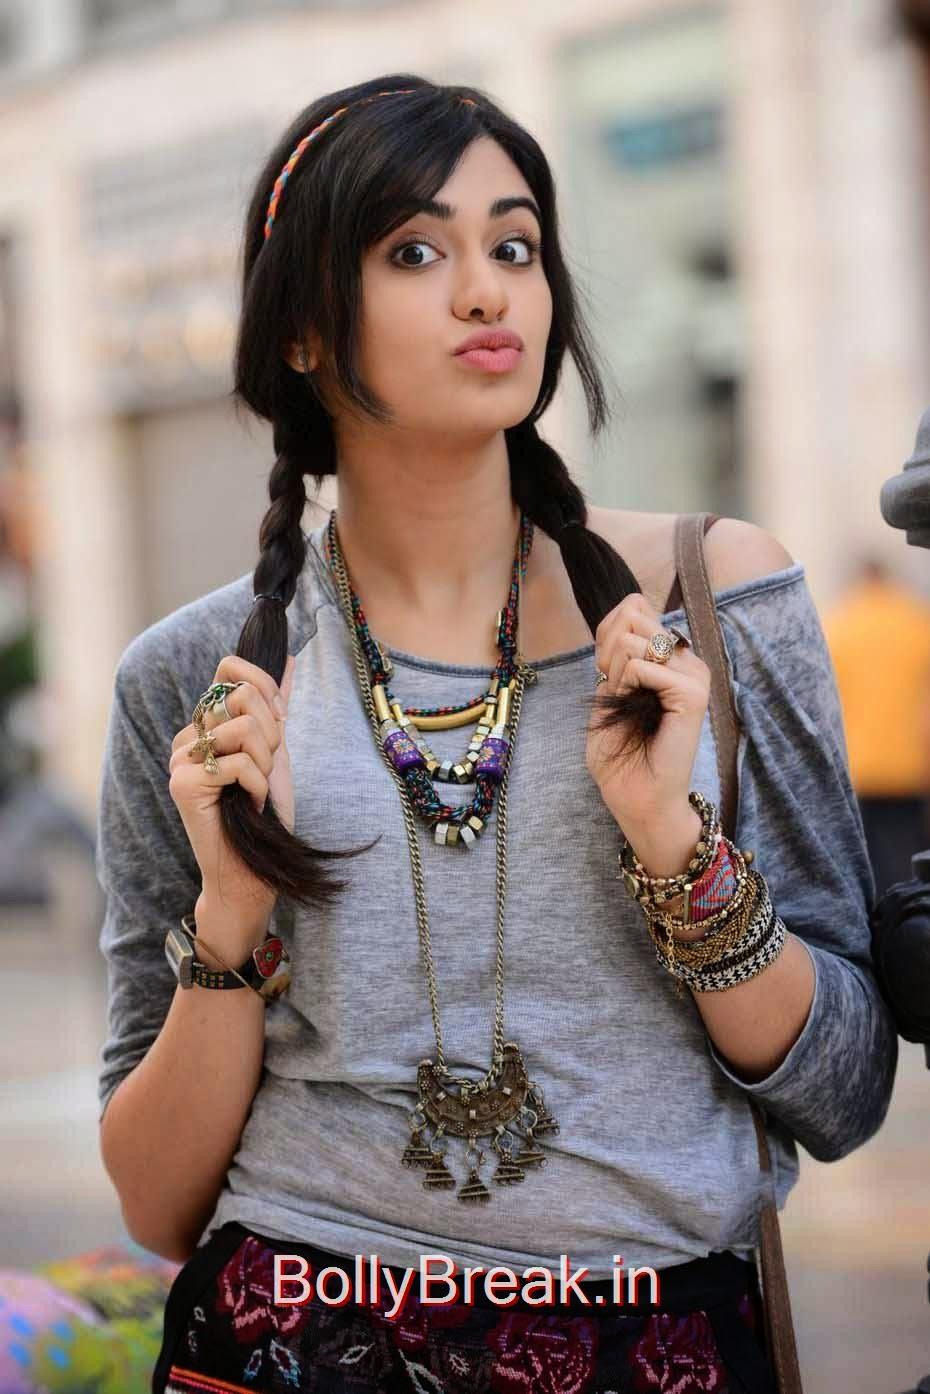 High Quality Adah Sharma Pics, Adah Sharma Hot Pics In Grey and White Top